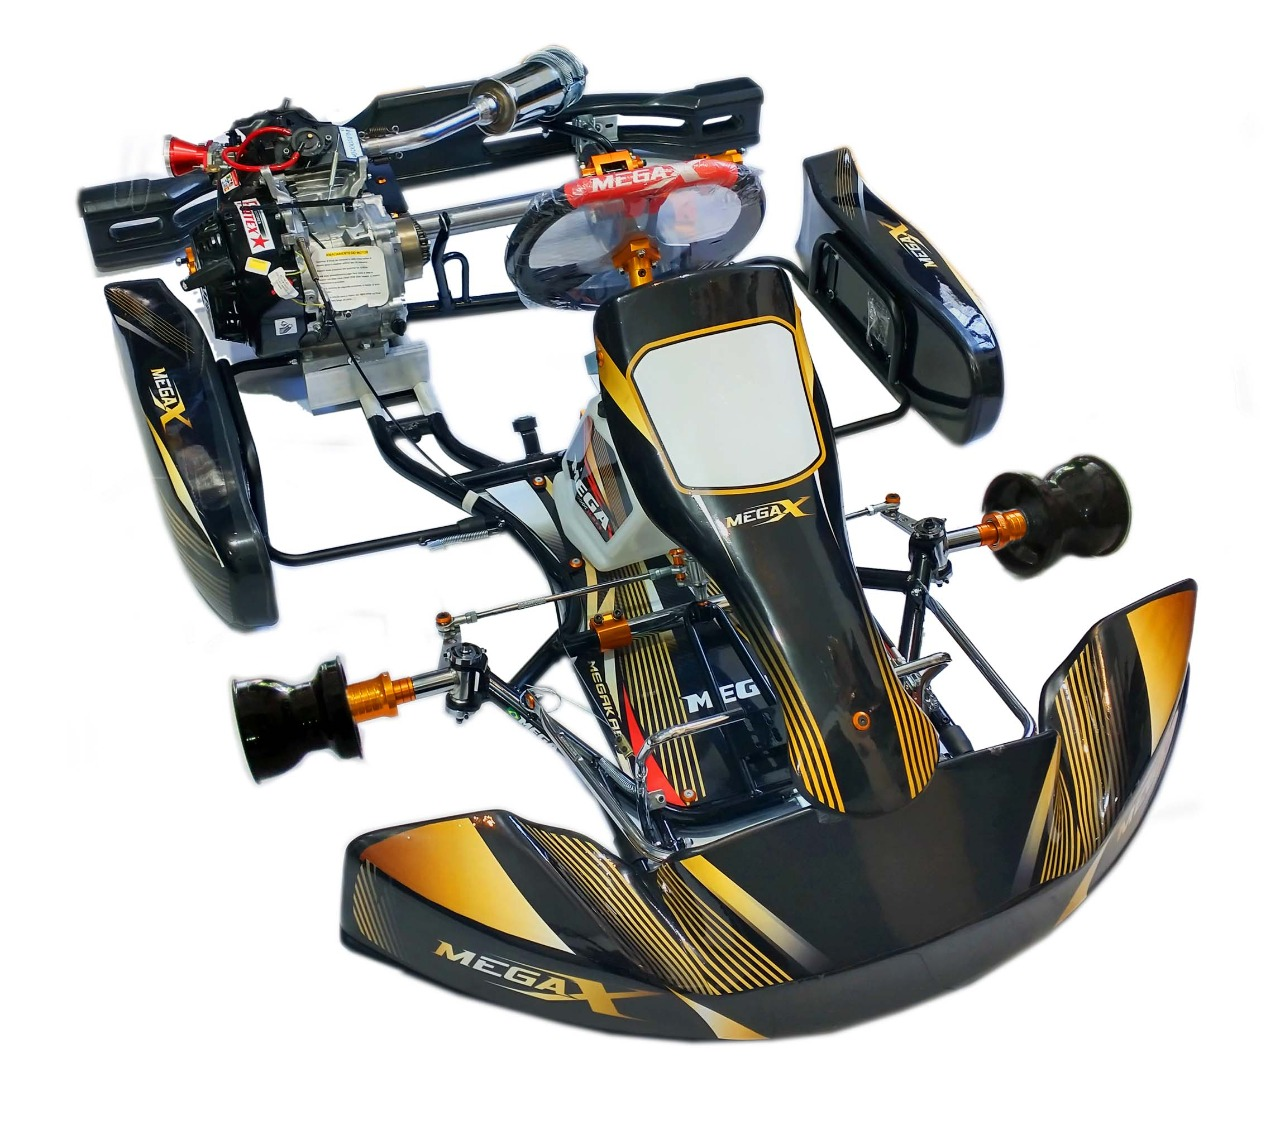 KART 2.0 COM MOTOR FORTEX G6 - 1174  - Mega Kart